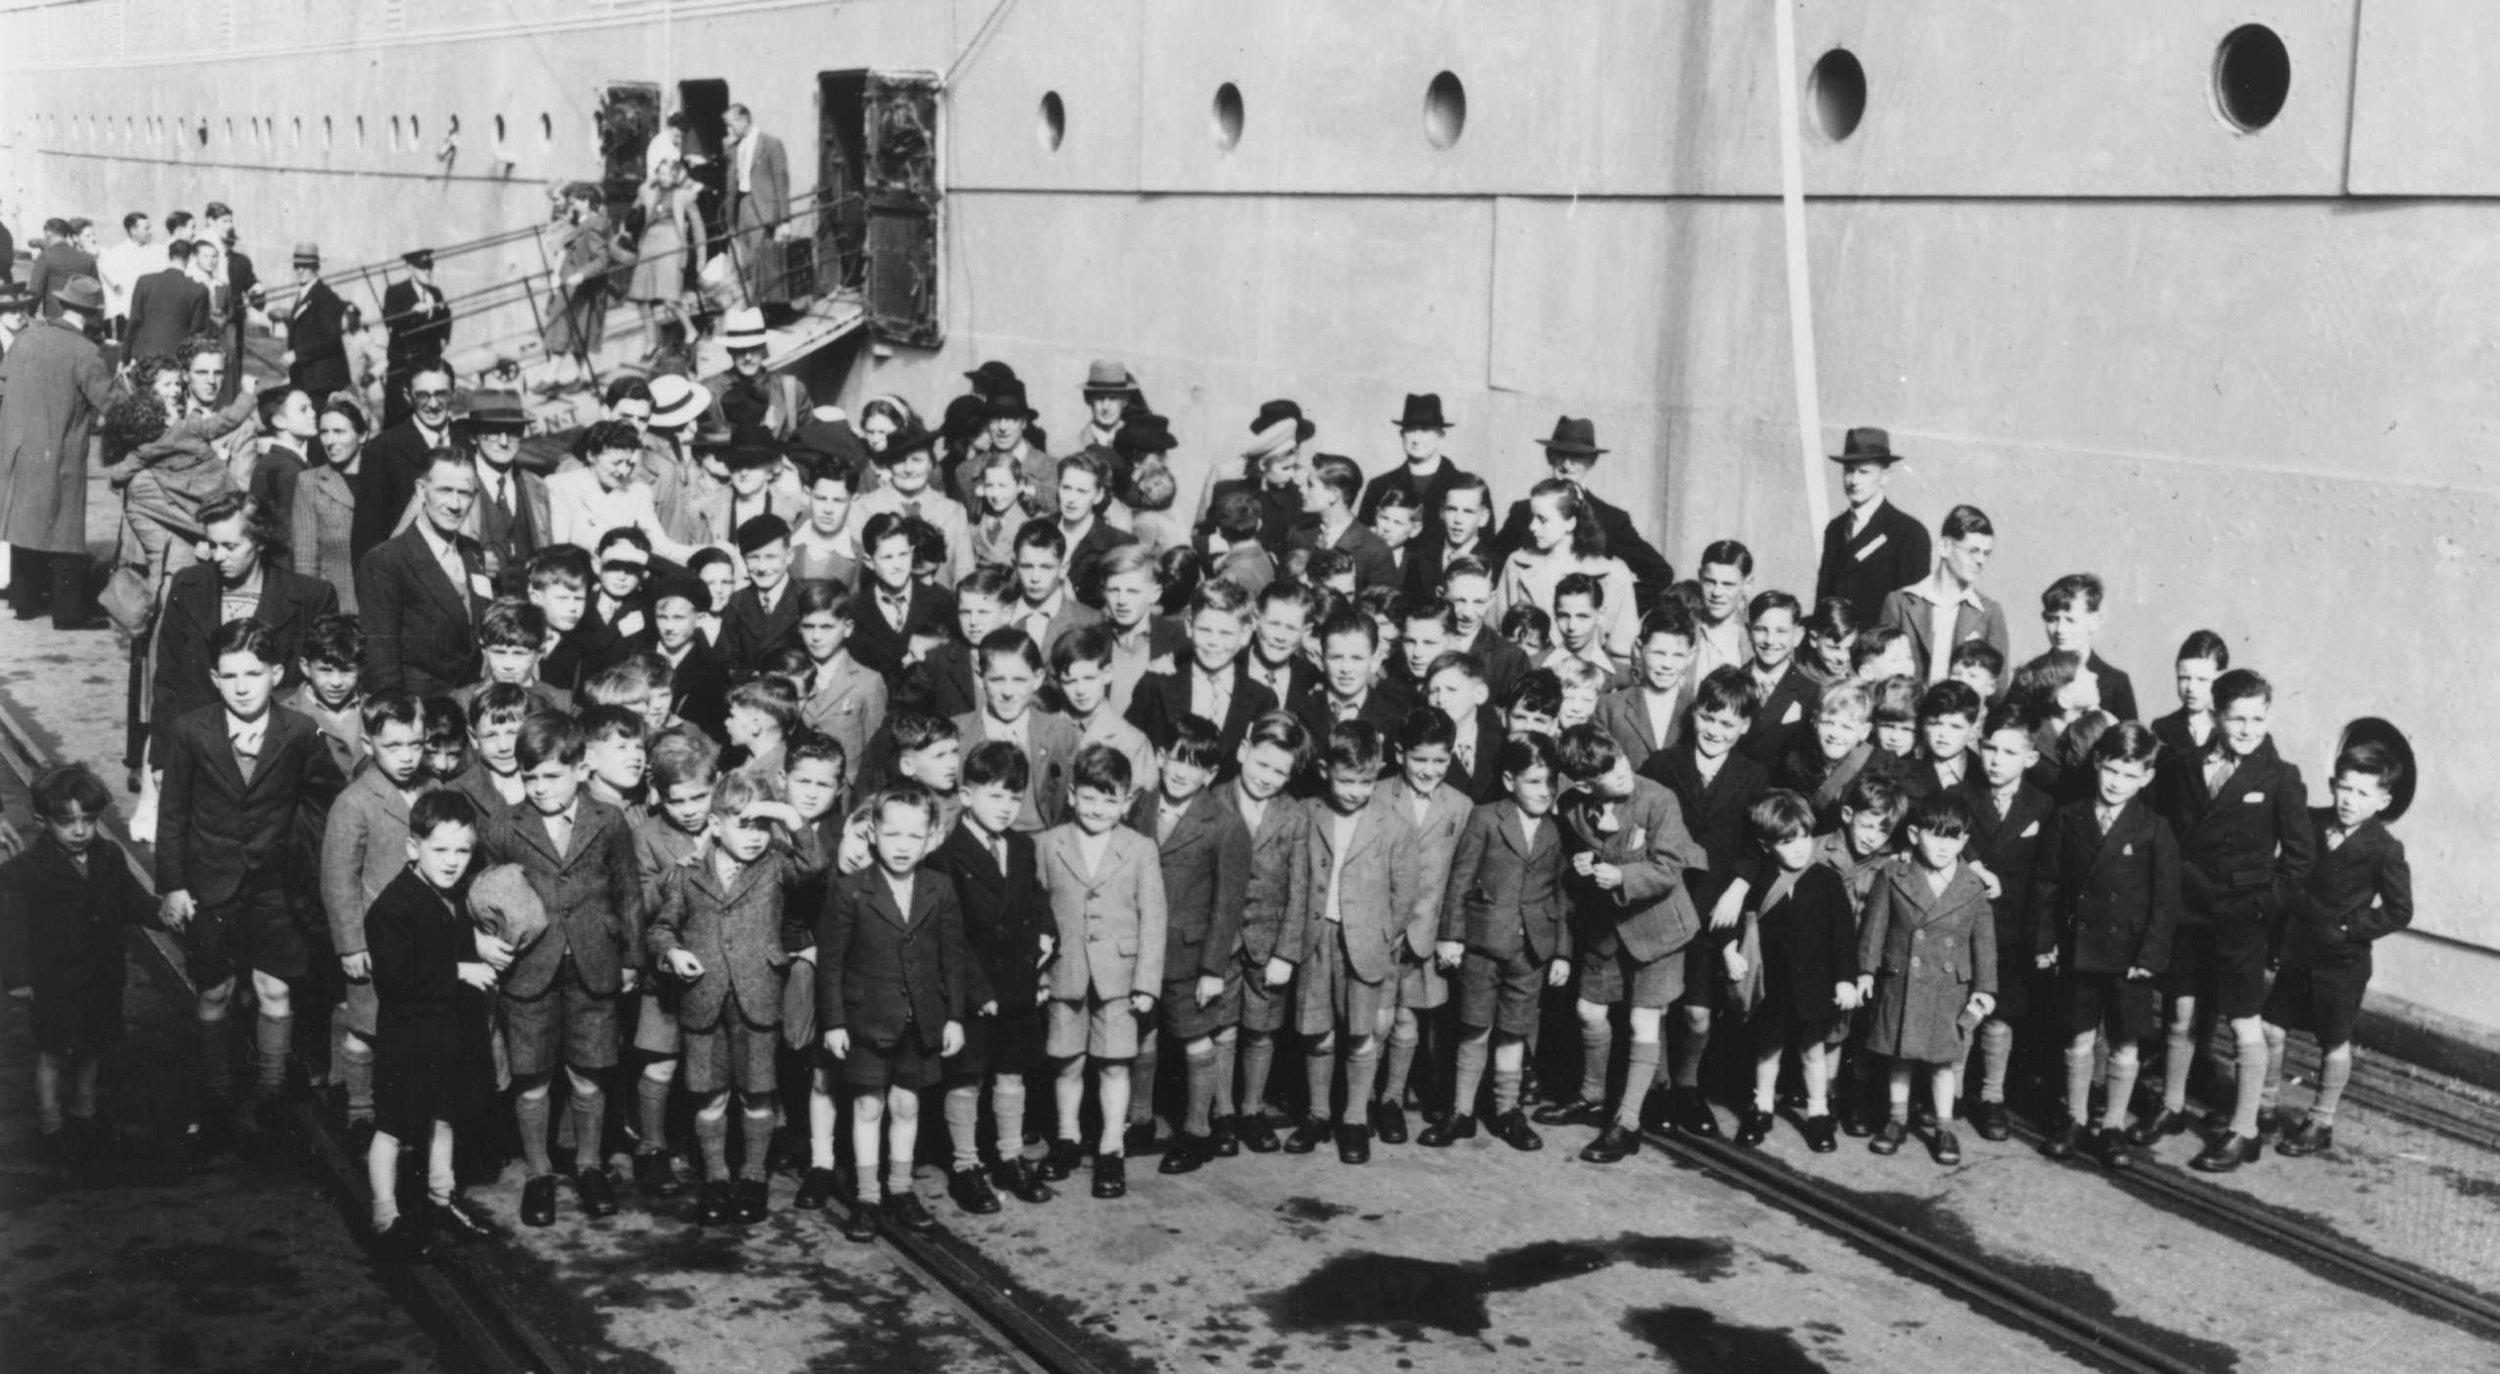 A group of British children arrive in Australia in 1947